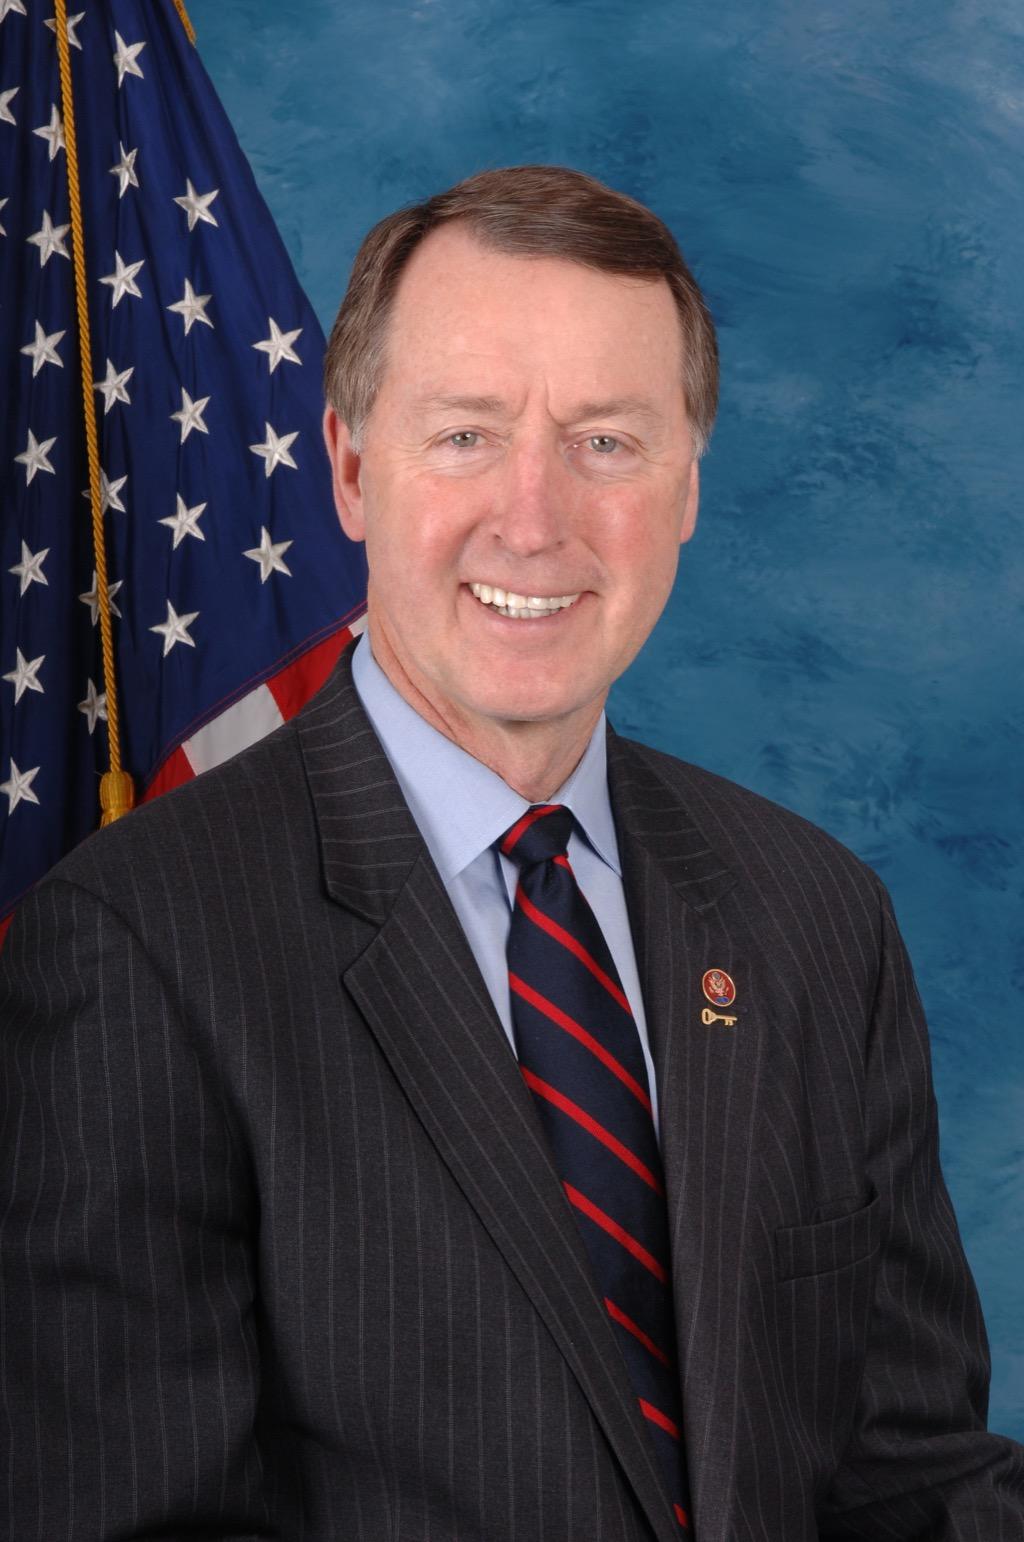 Bob_Etheridge politicians